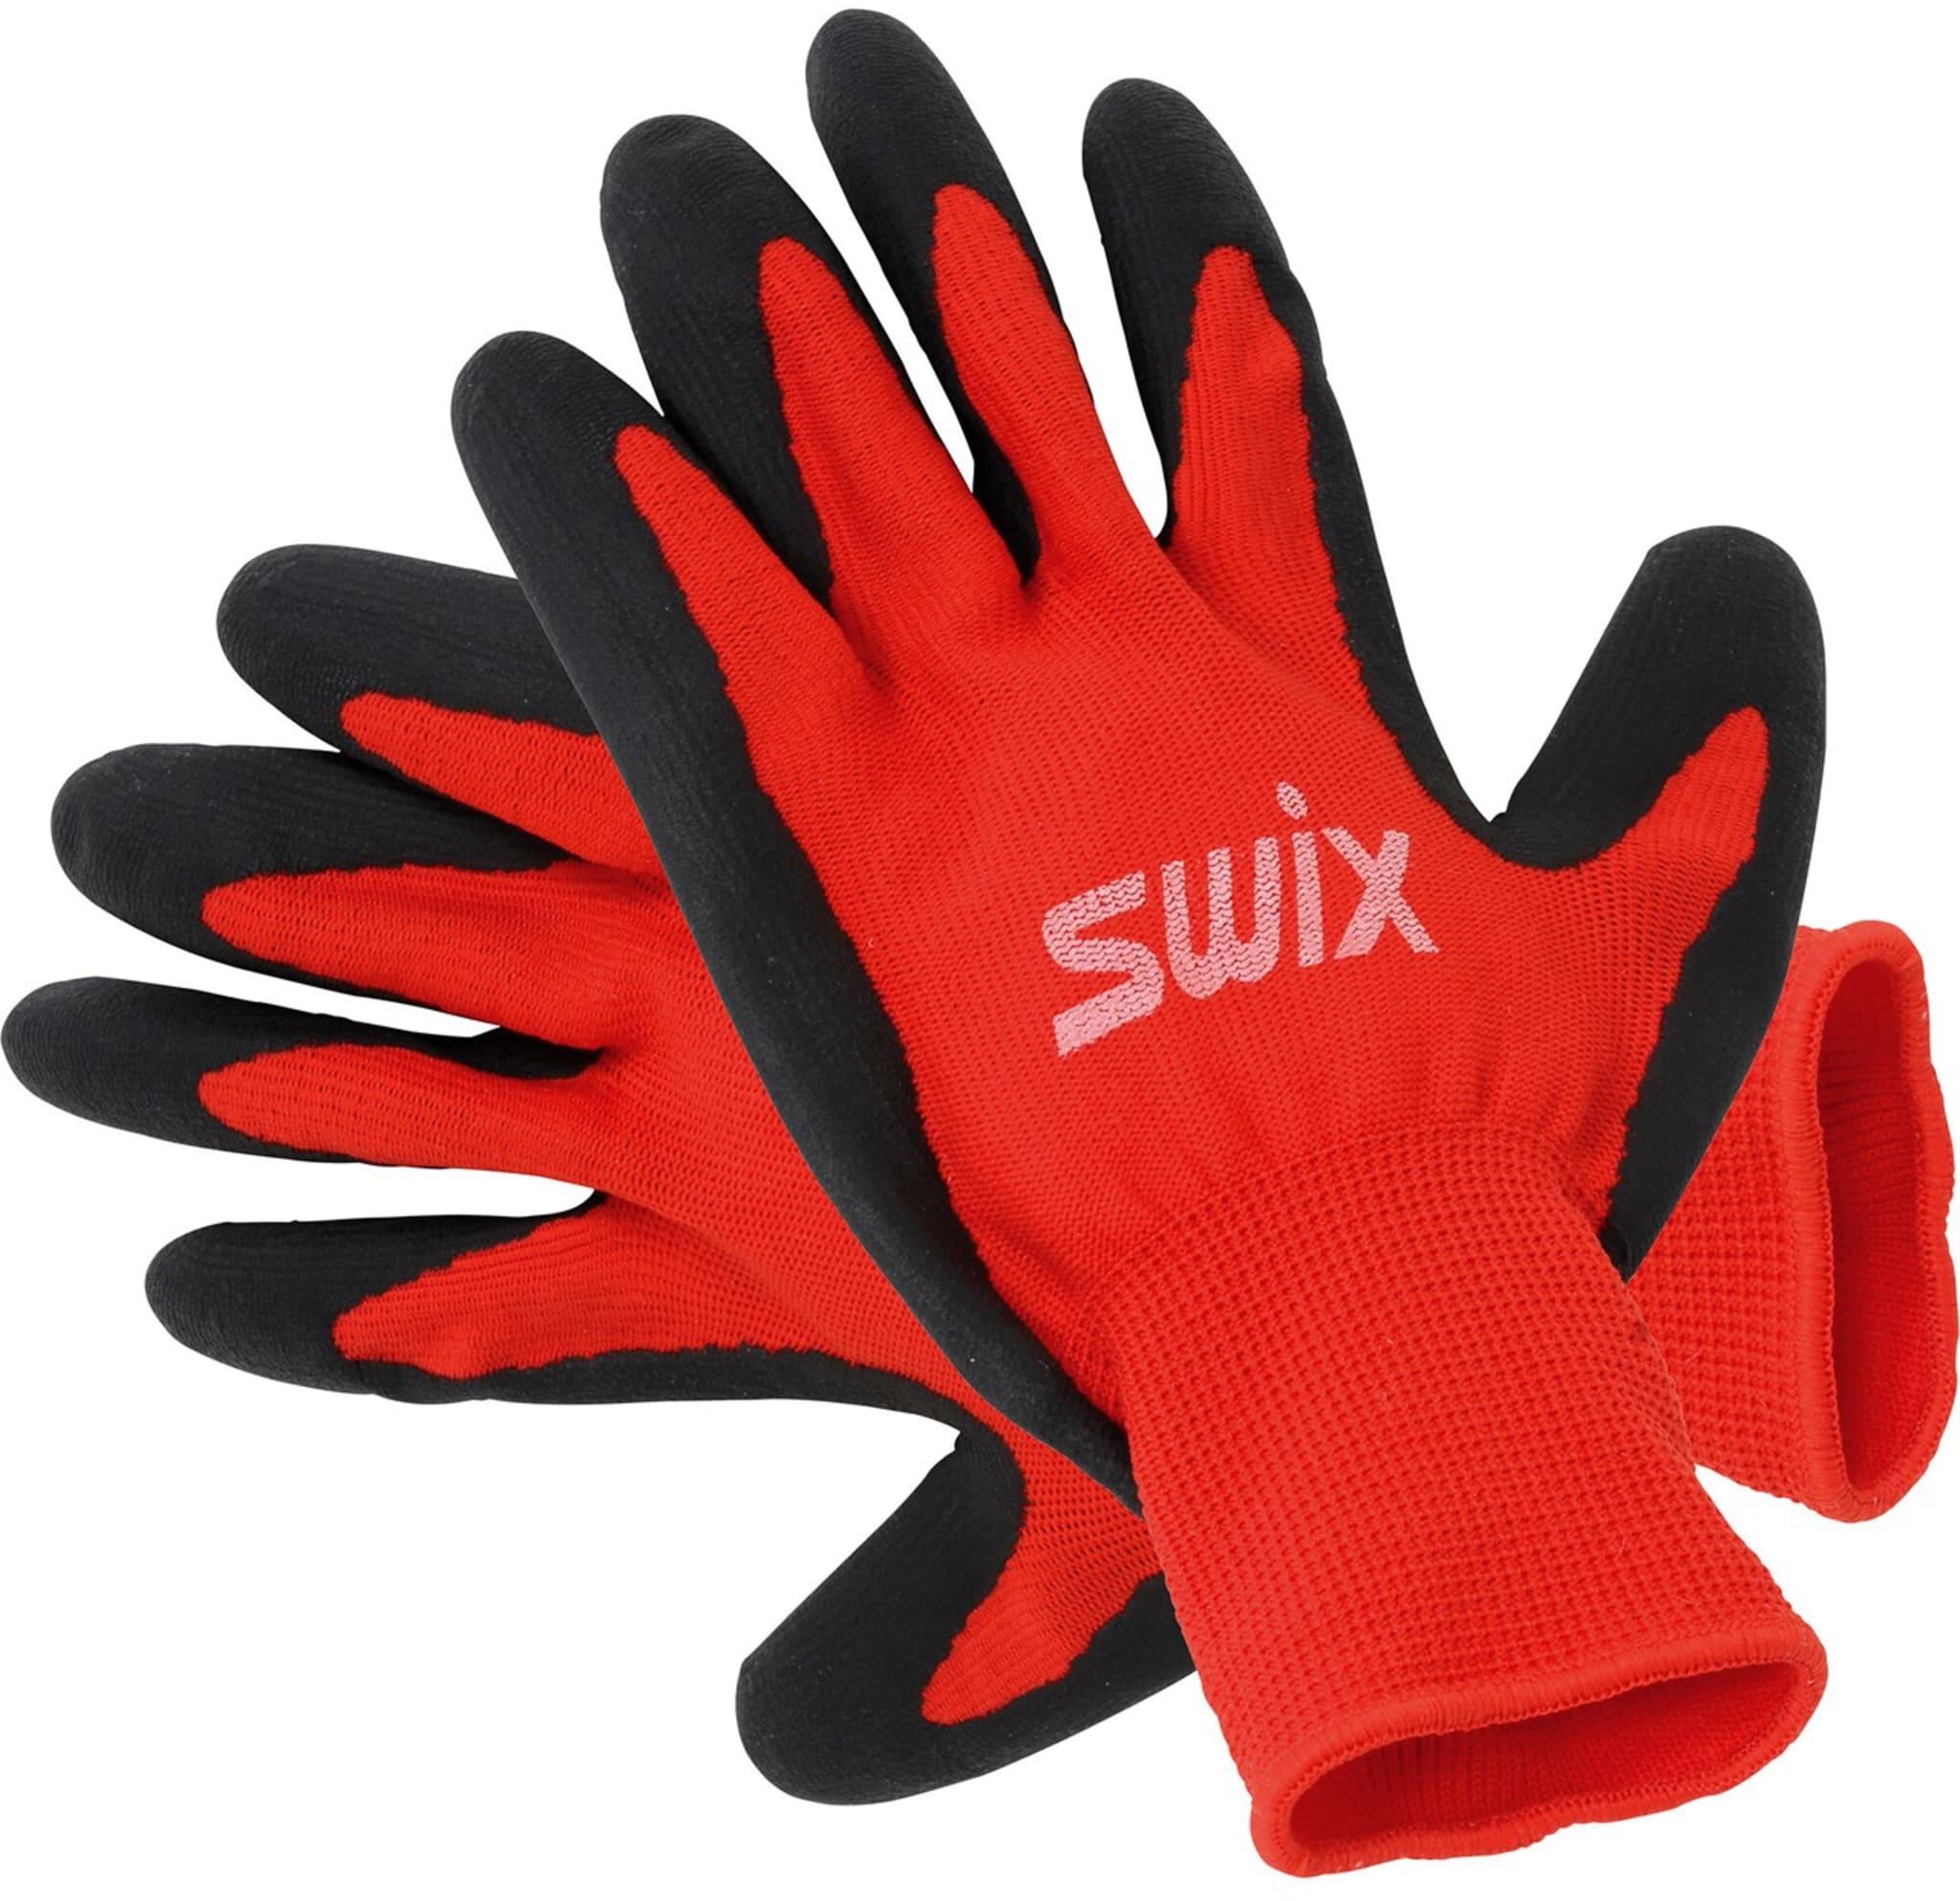 R196 Tuning glove